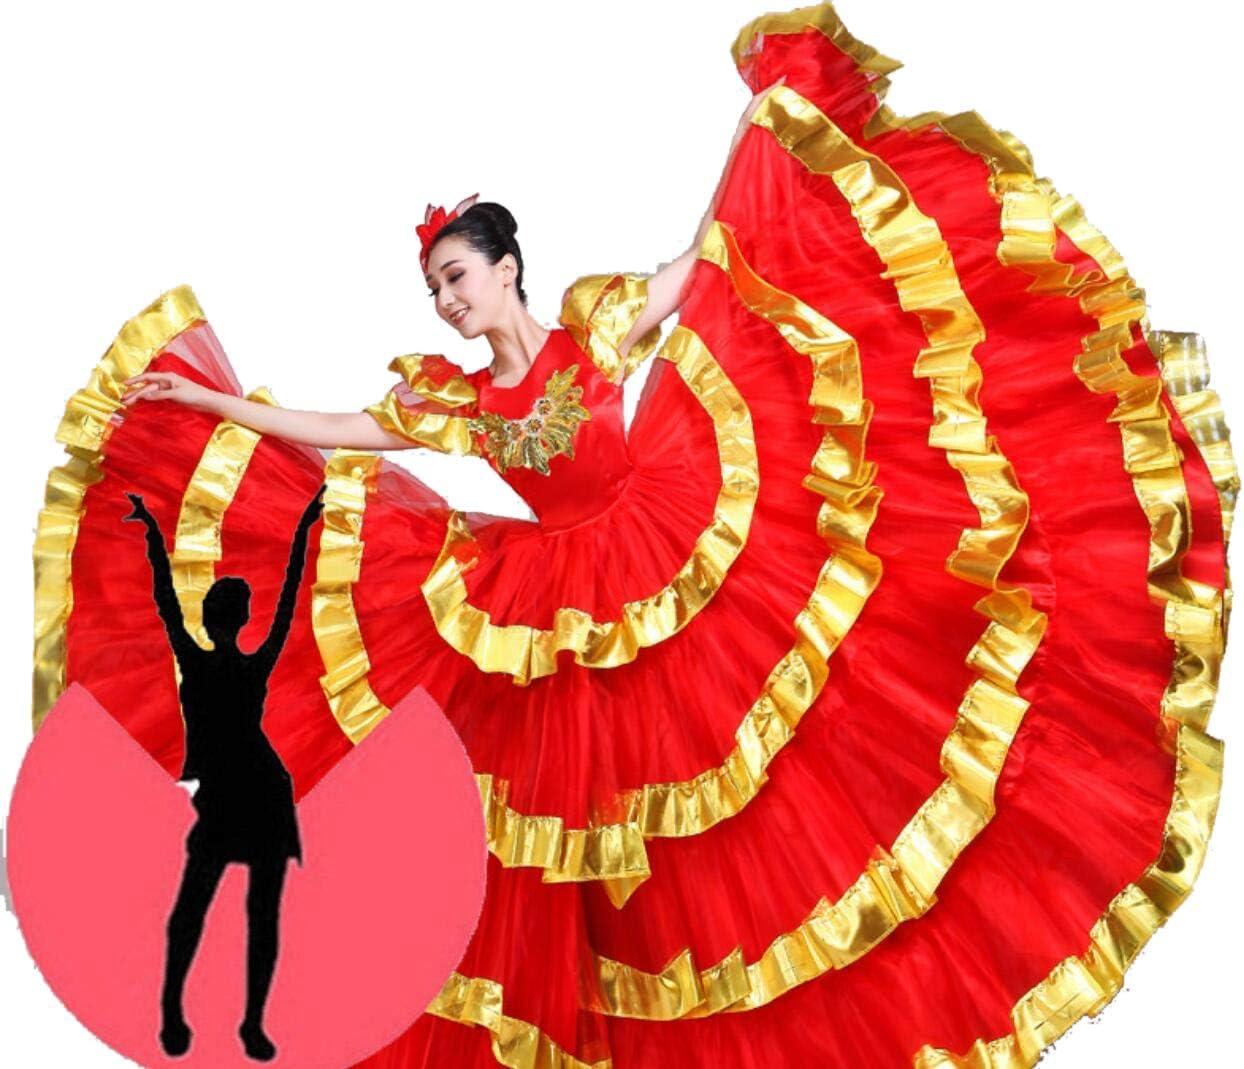 Black /& Red Polka Dot Scarf Rock and Roll Spanish Flamenco Fancy Dress Accessory